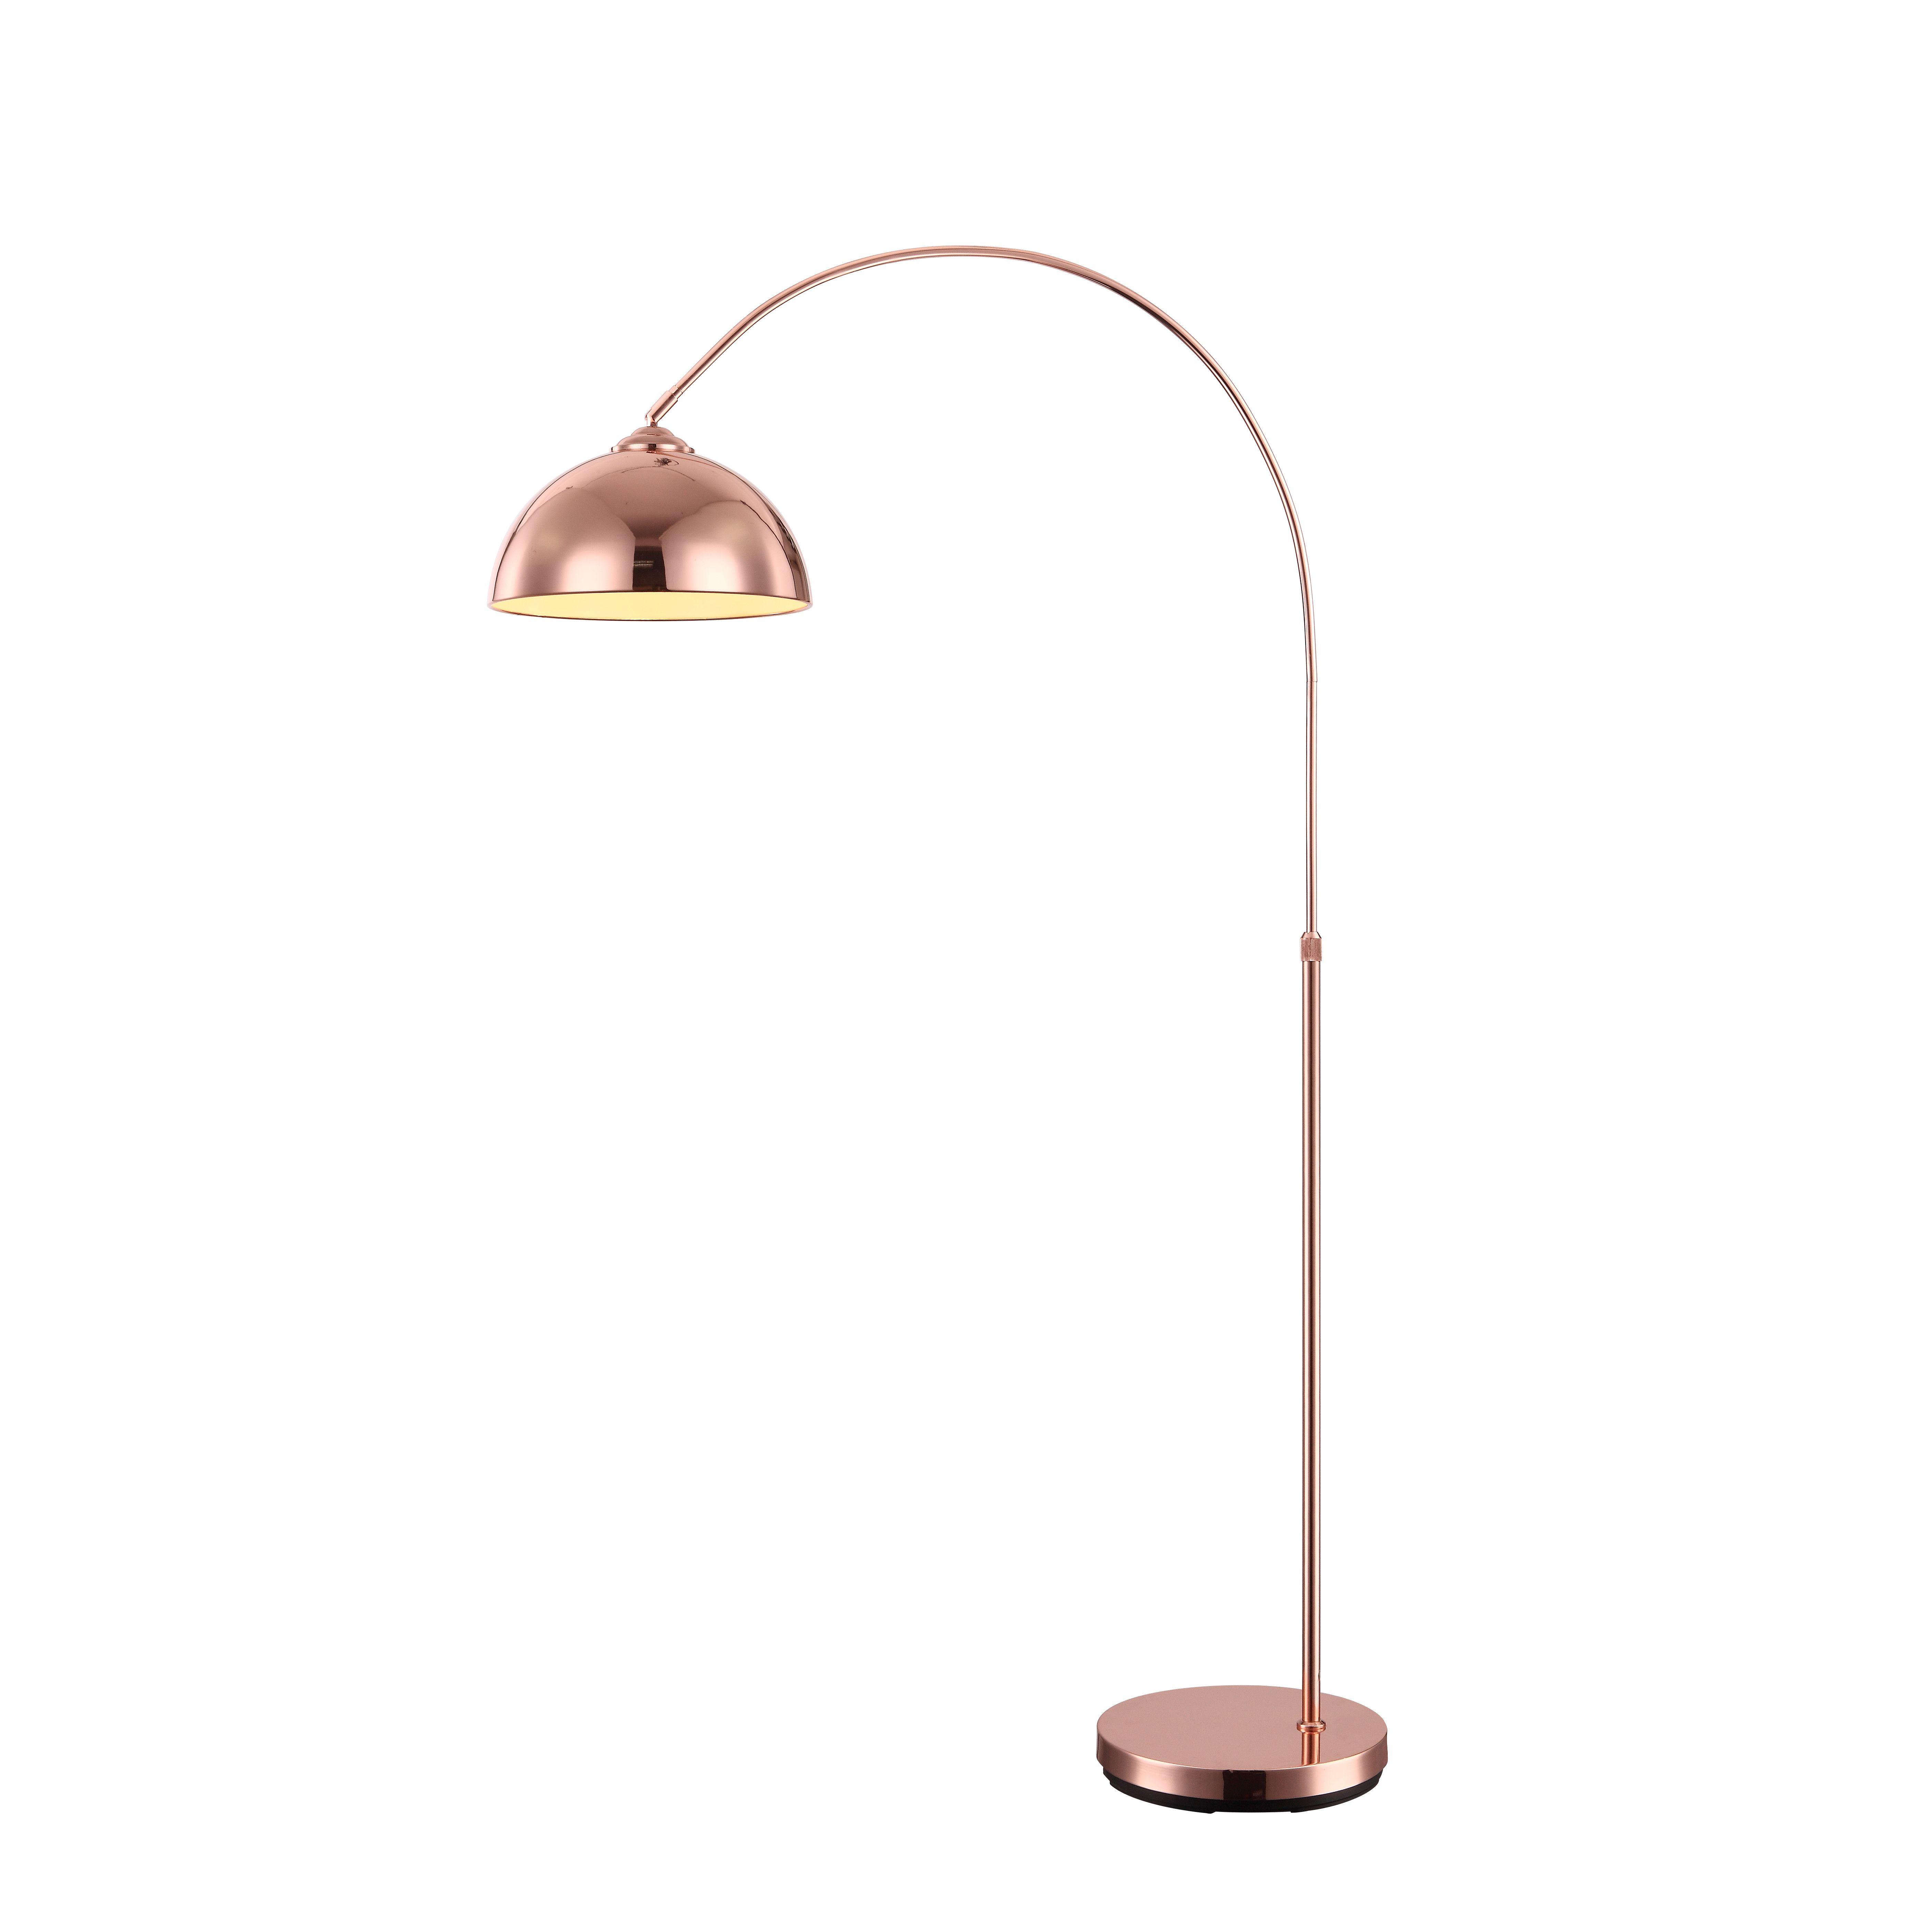 bronze lamp boom pin plus arched euro finish lamps floor arch style possini